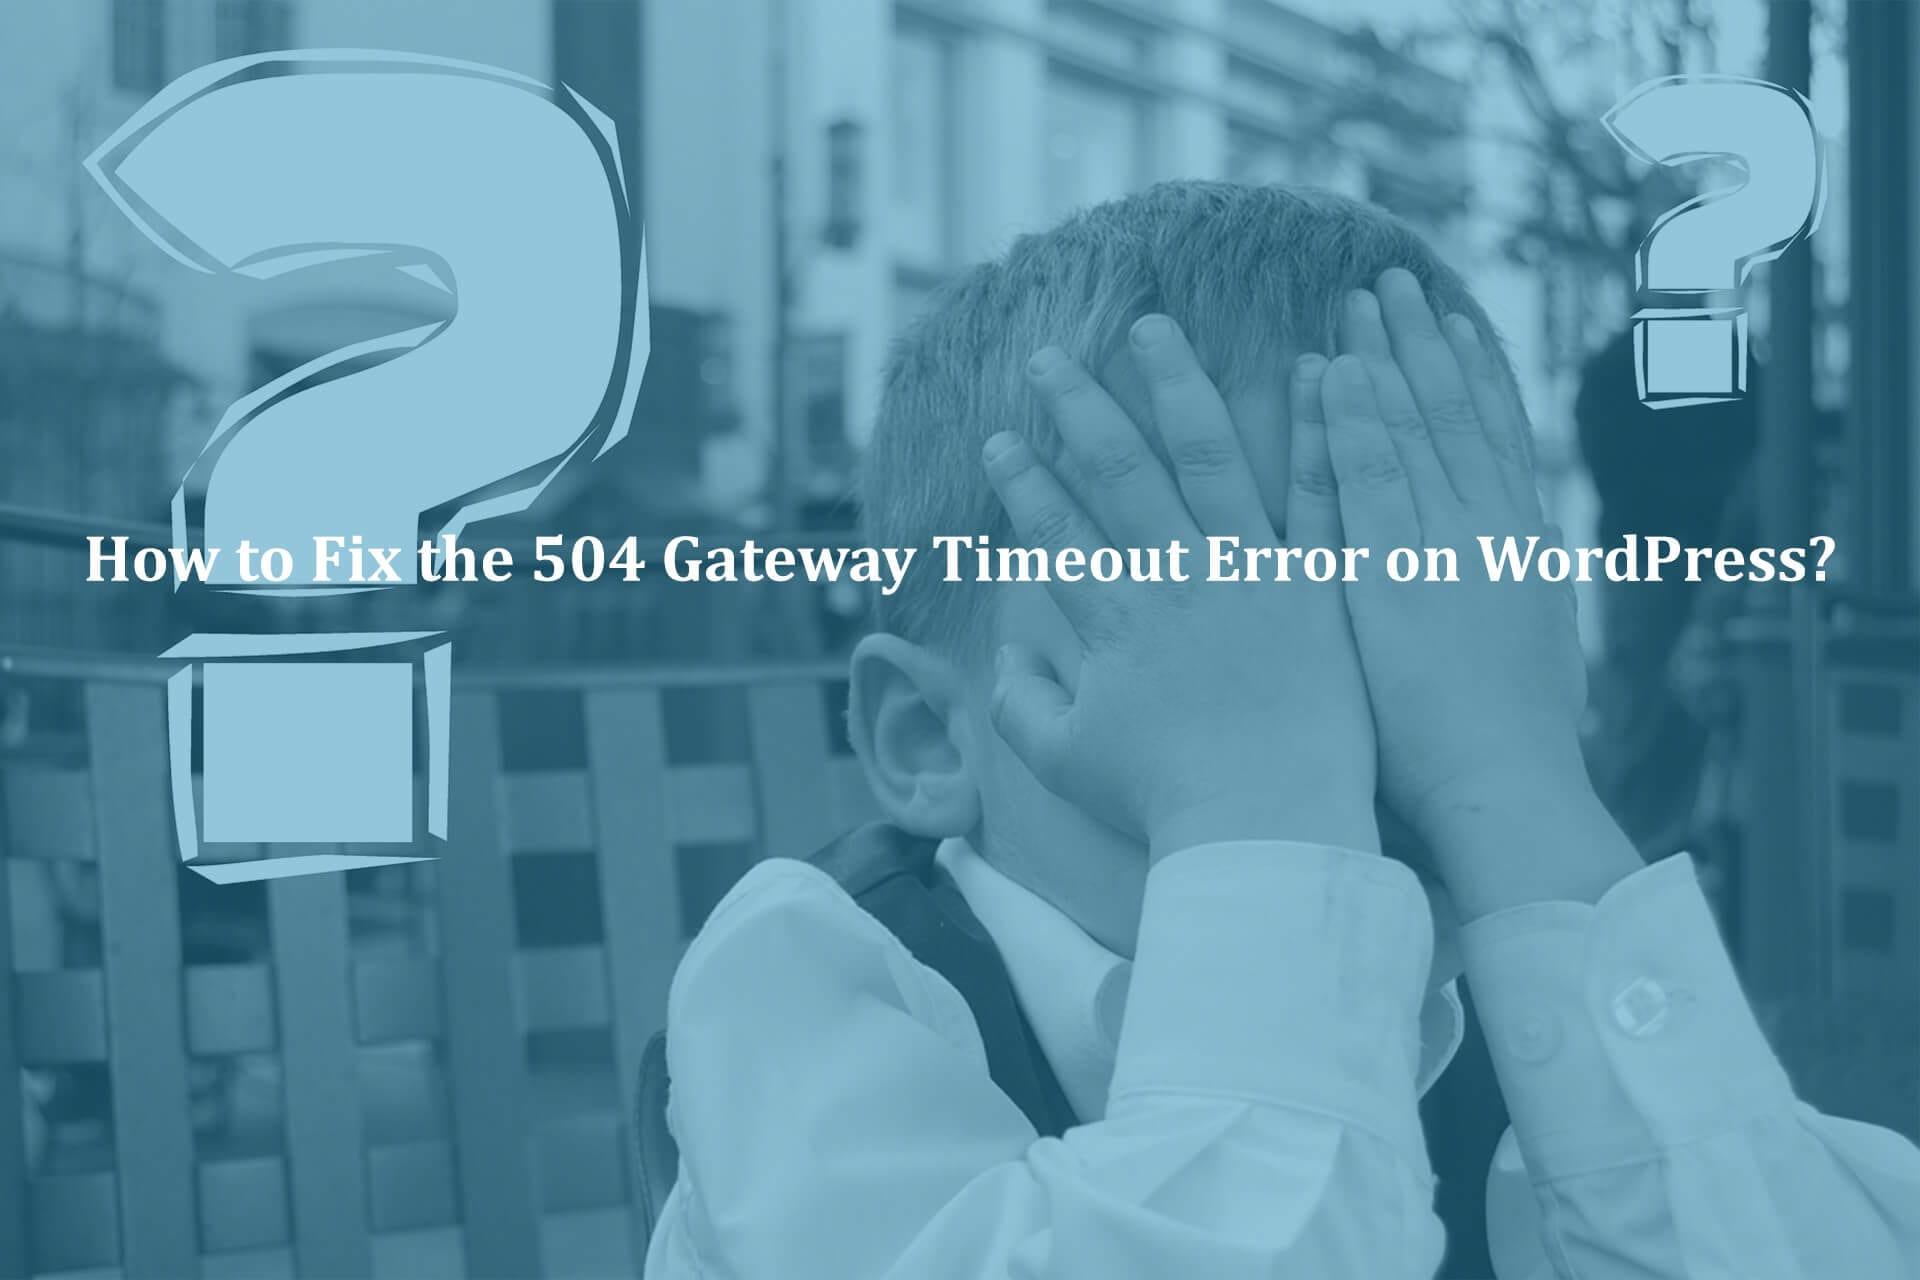 How-to-Fix-the-504-Gateway-Timeout-Error-on-WordPress